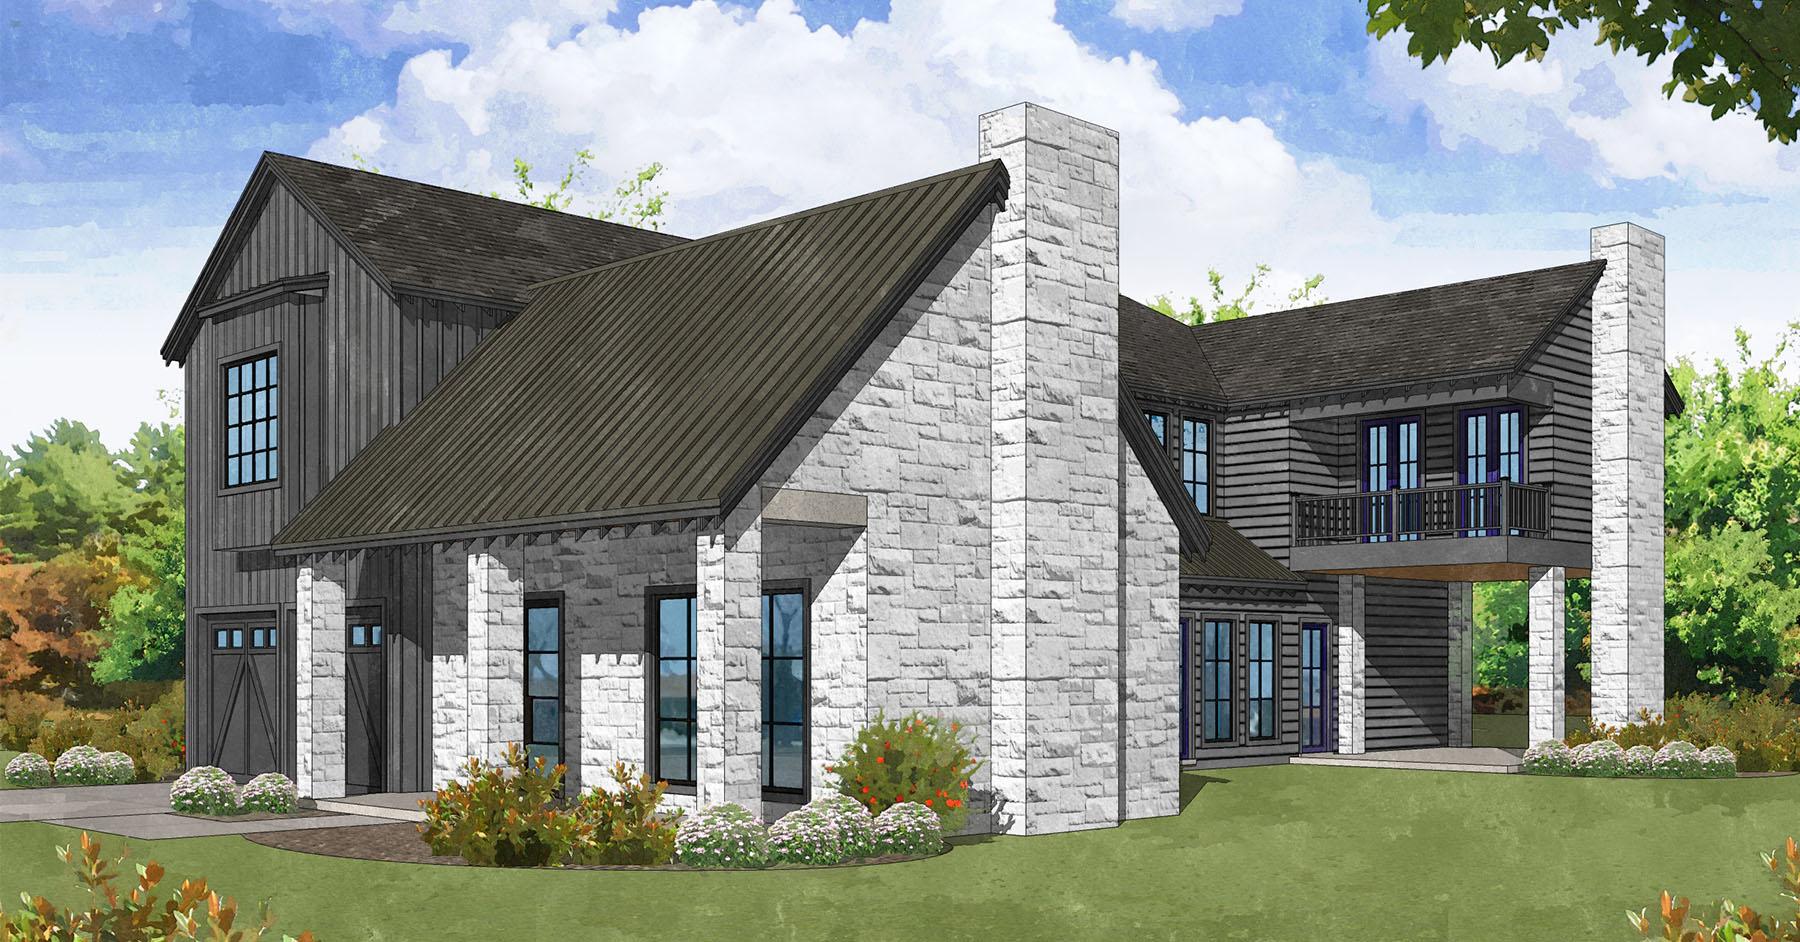 Westview Terrace <br/> Modern Farmhouse Style, Completion Fall 2020 <br/> 6530 Corbin, Houston, TX 77055